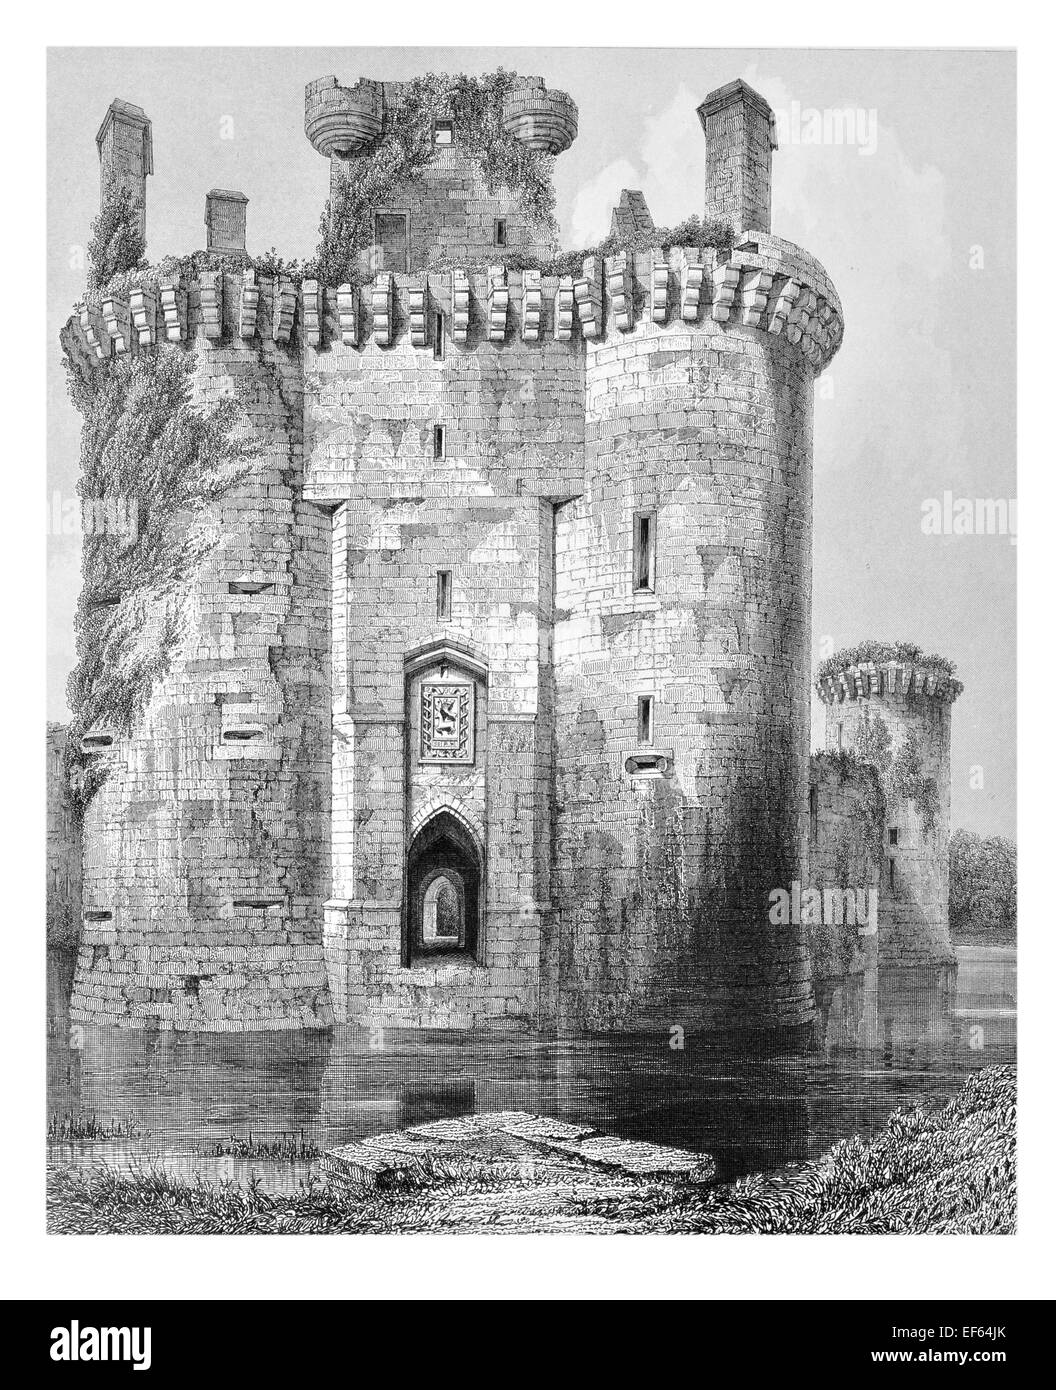 1852 Caerlaveroc sogar dreieckigen Burg Dumfries Eingang Tor und Flanking Turm Stockbild